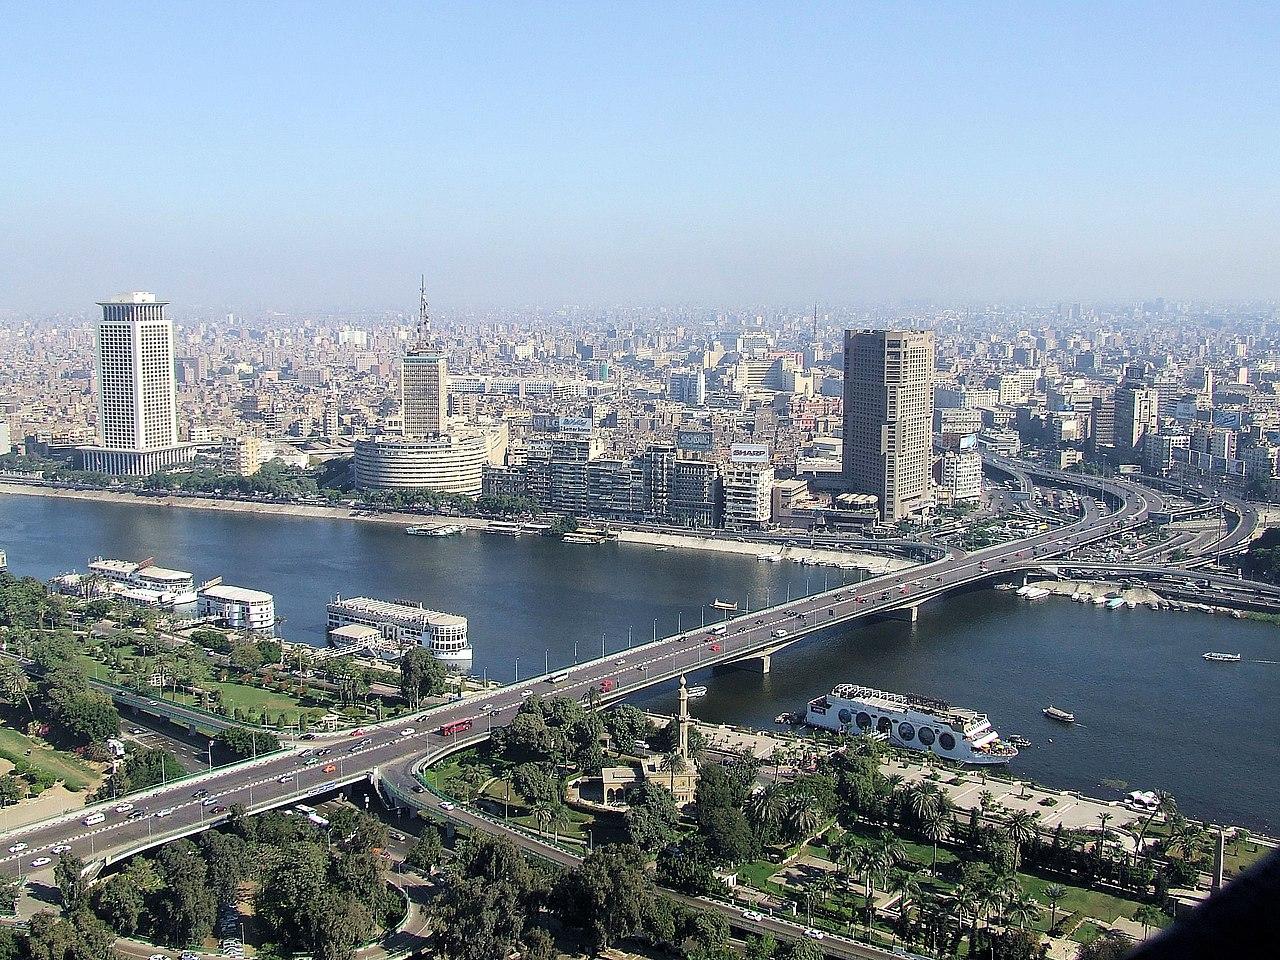 Vista de El Cairo